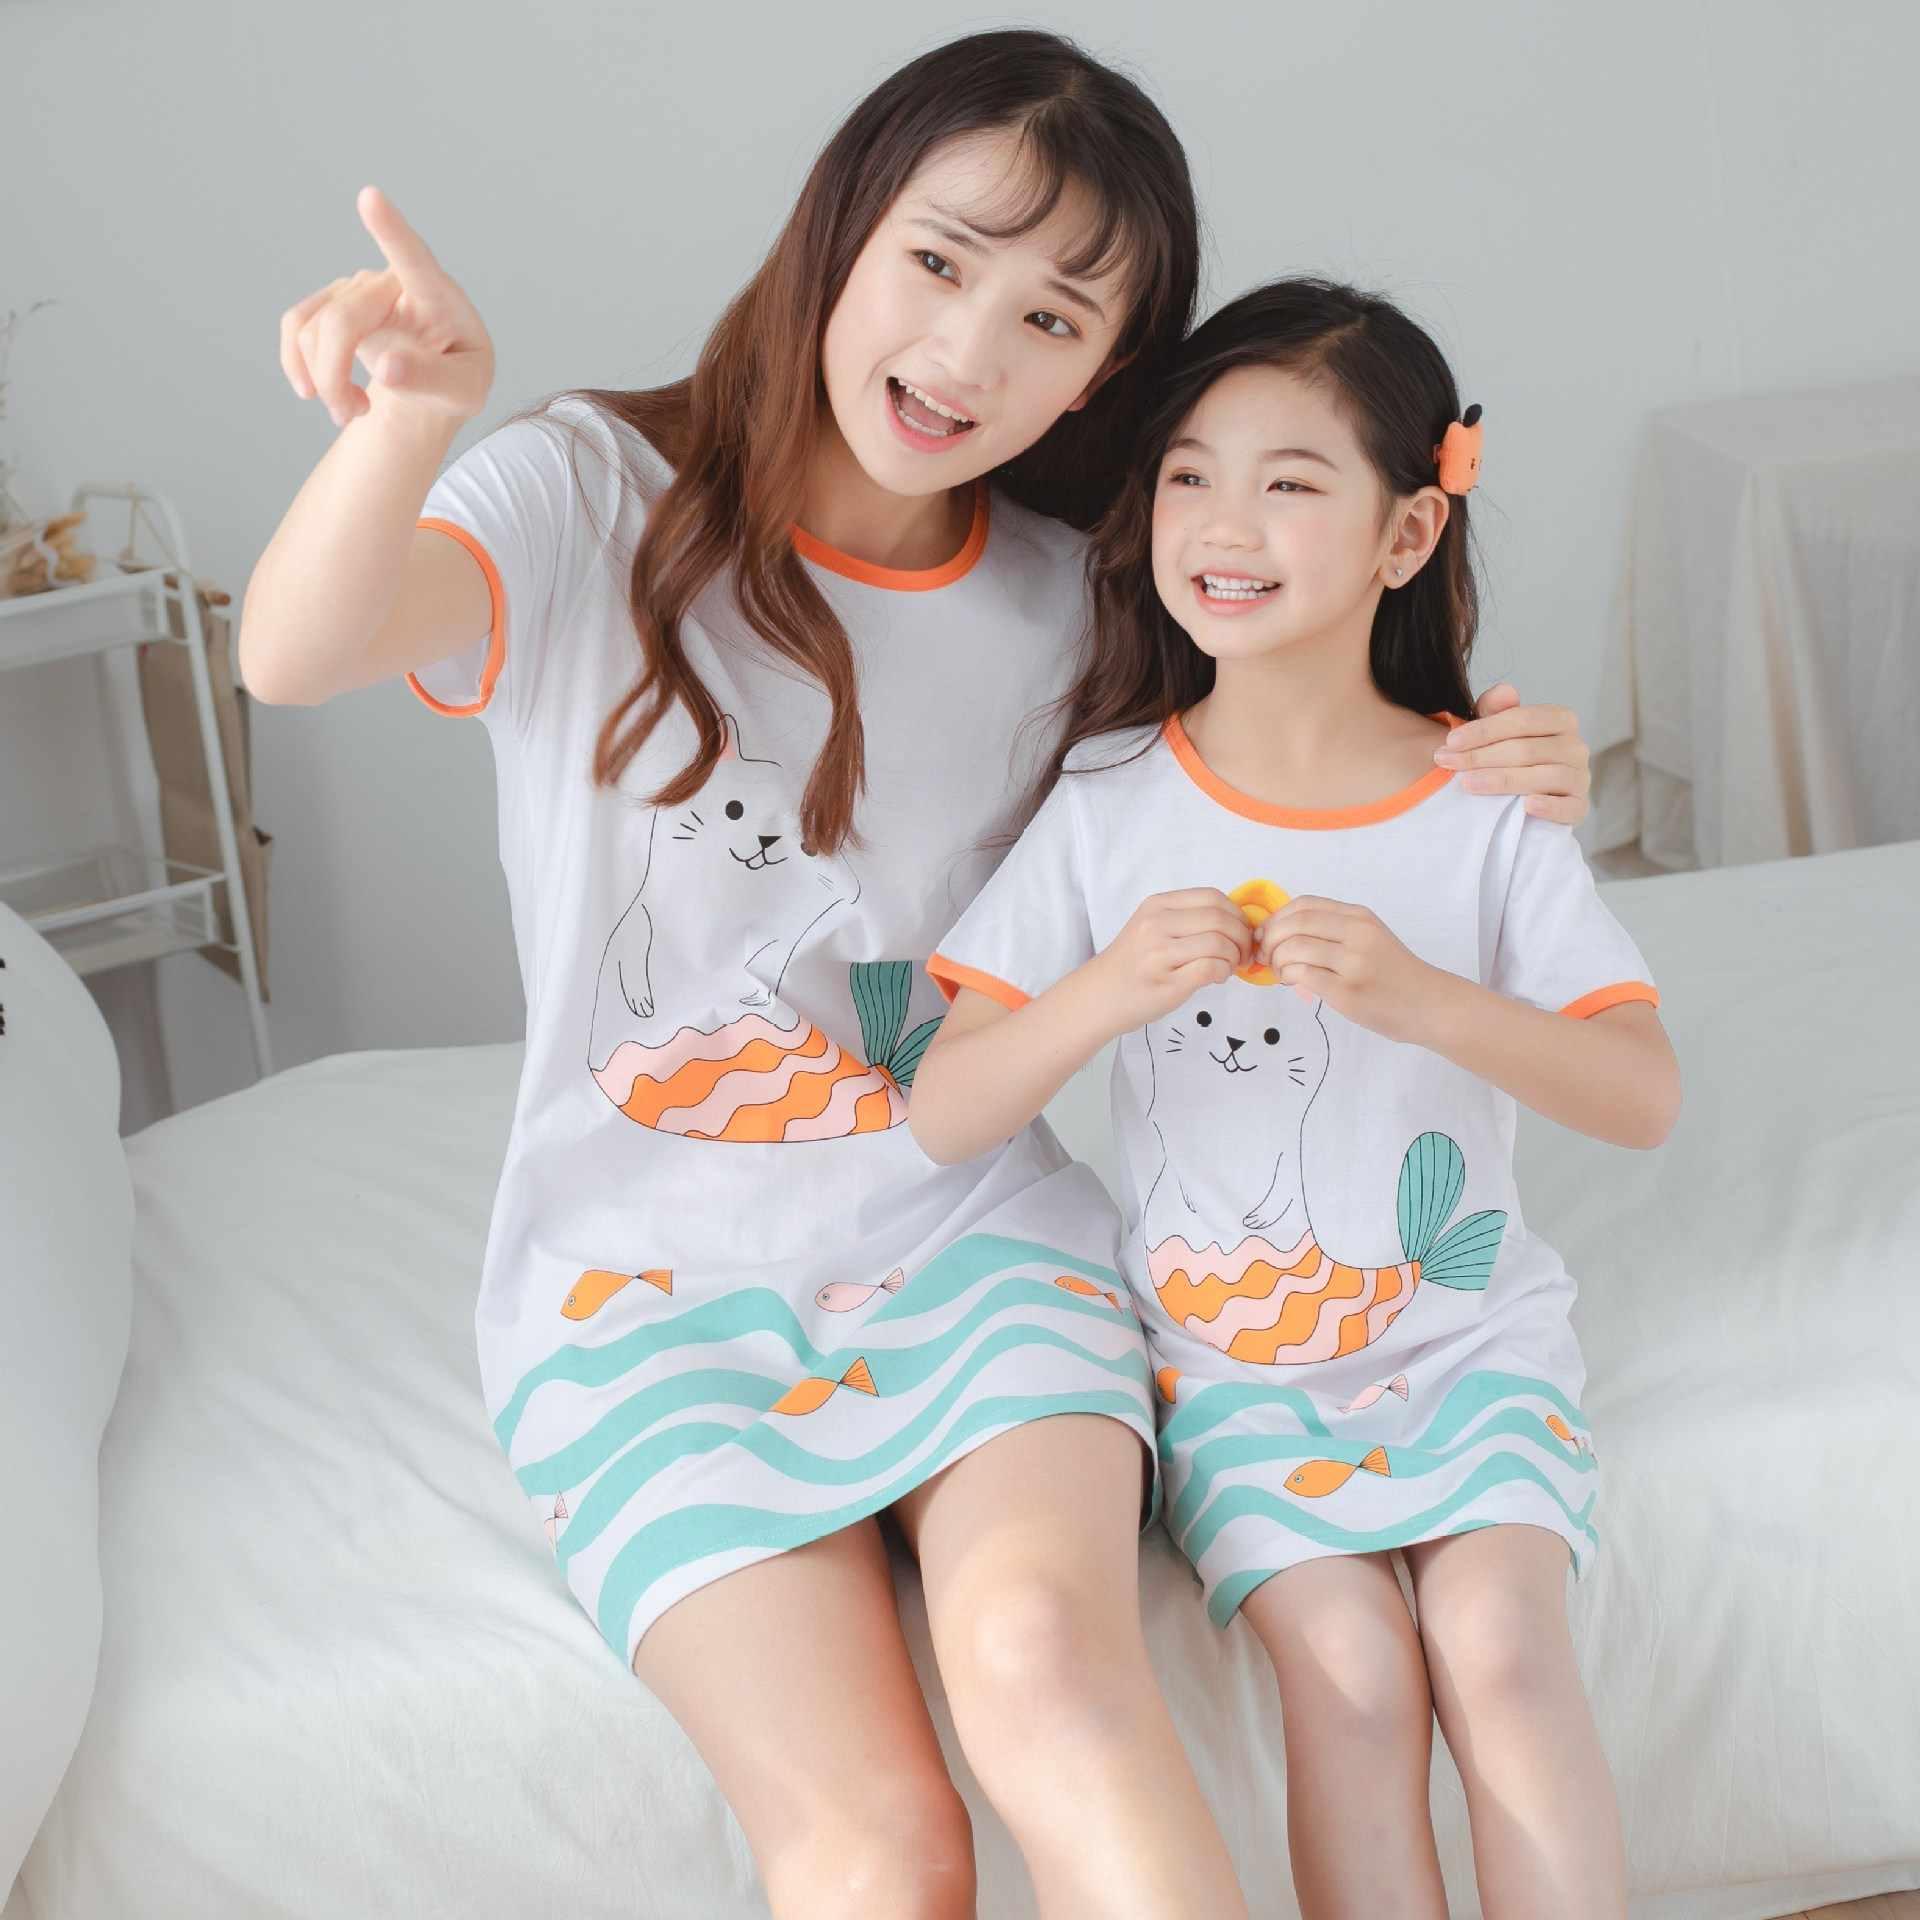 Mode Zomer Meisjes Nachtjapon Pyjama Kids Korte Mouwen Nachthemd Leuke 100% Katoen Kind Baby Slapen Jurk 8 10 12 14 jaar